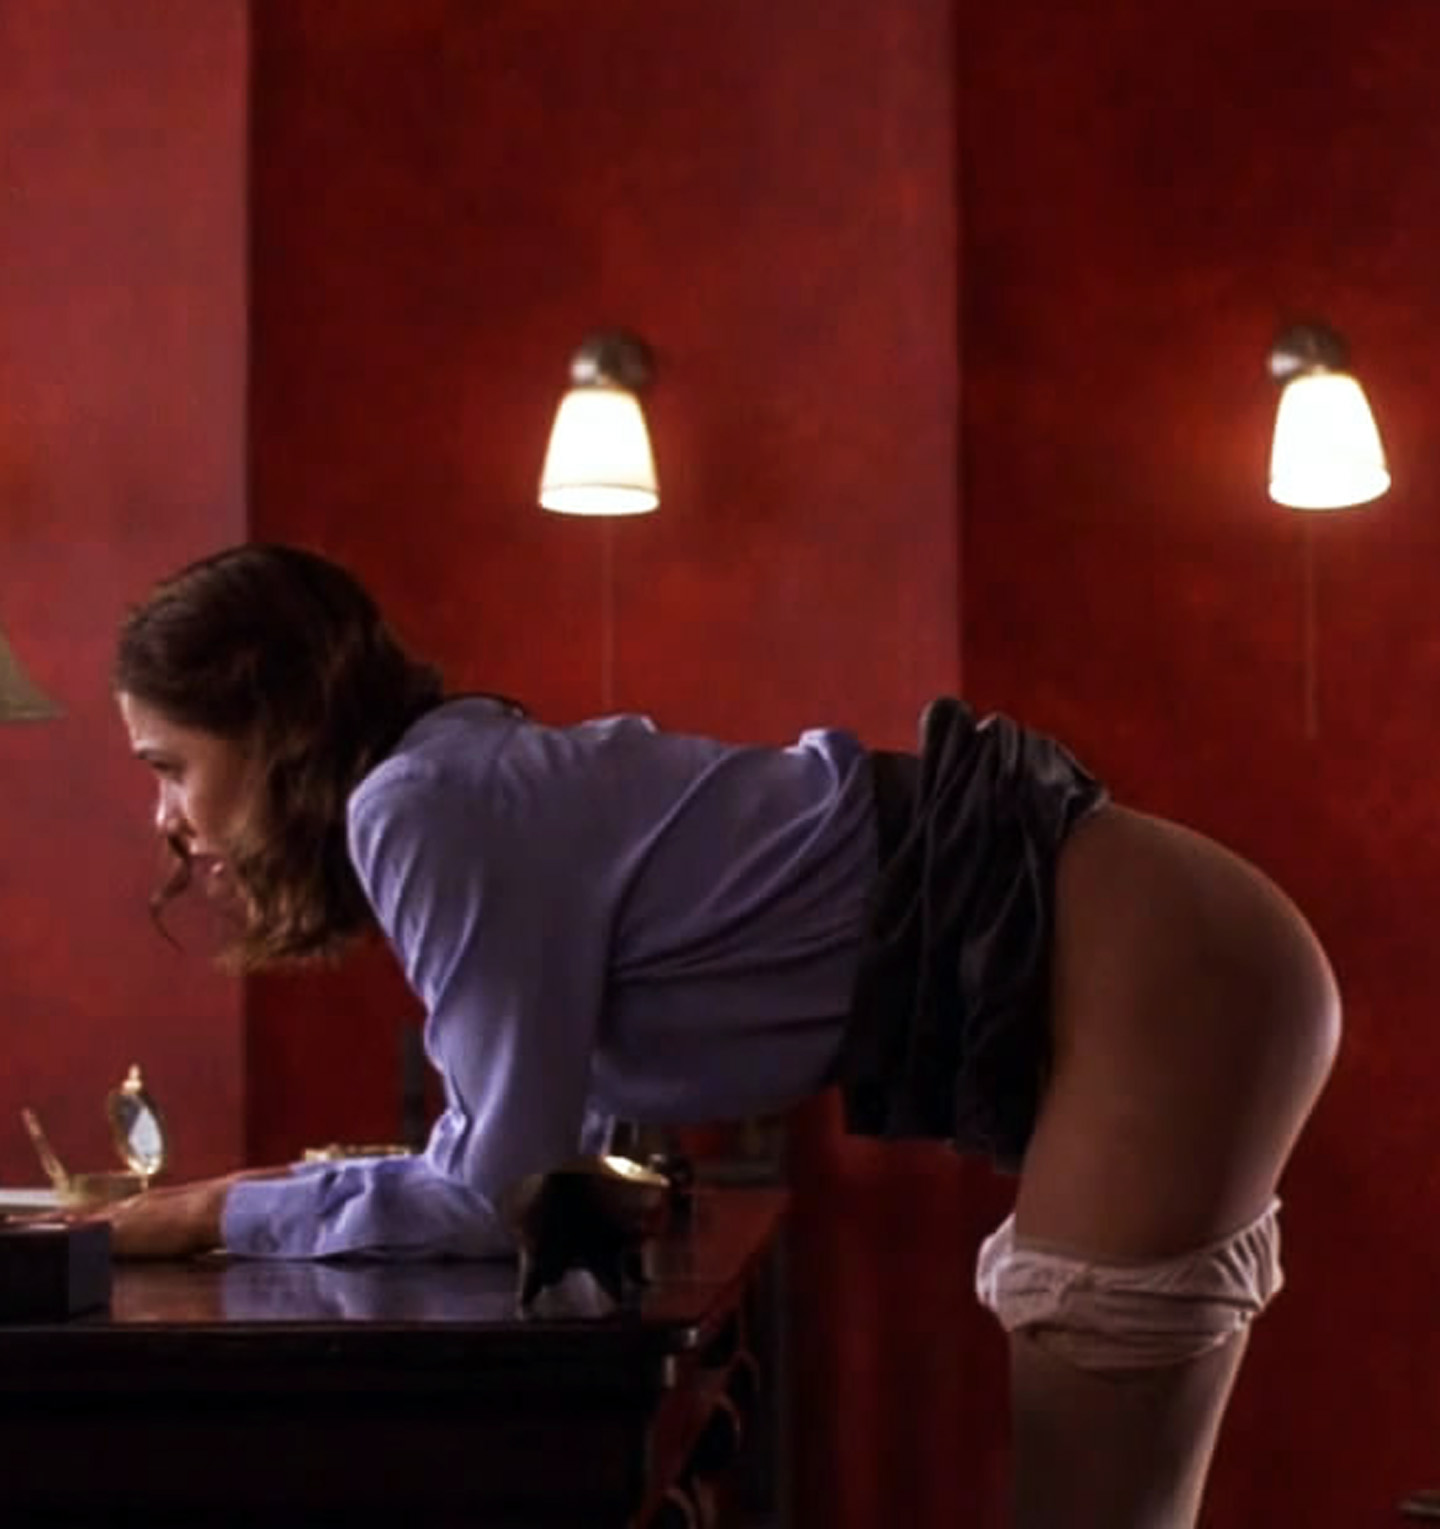 Maggie gyllenhaal in the deuce s01e04 10